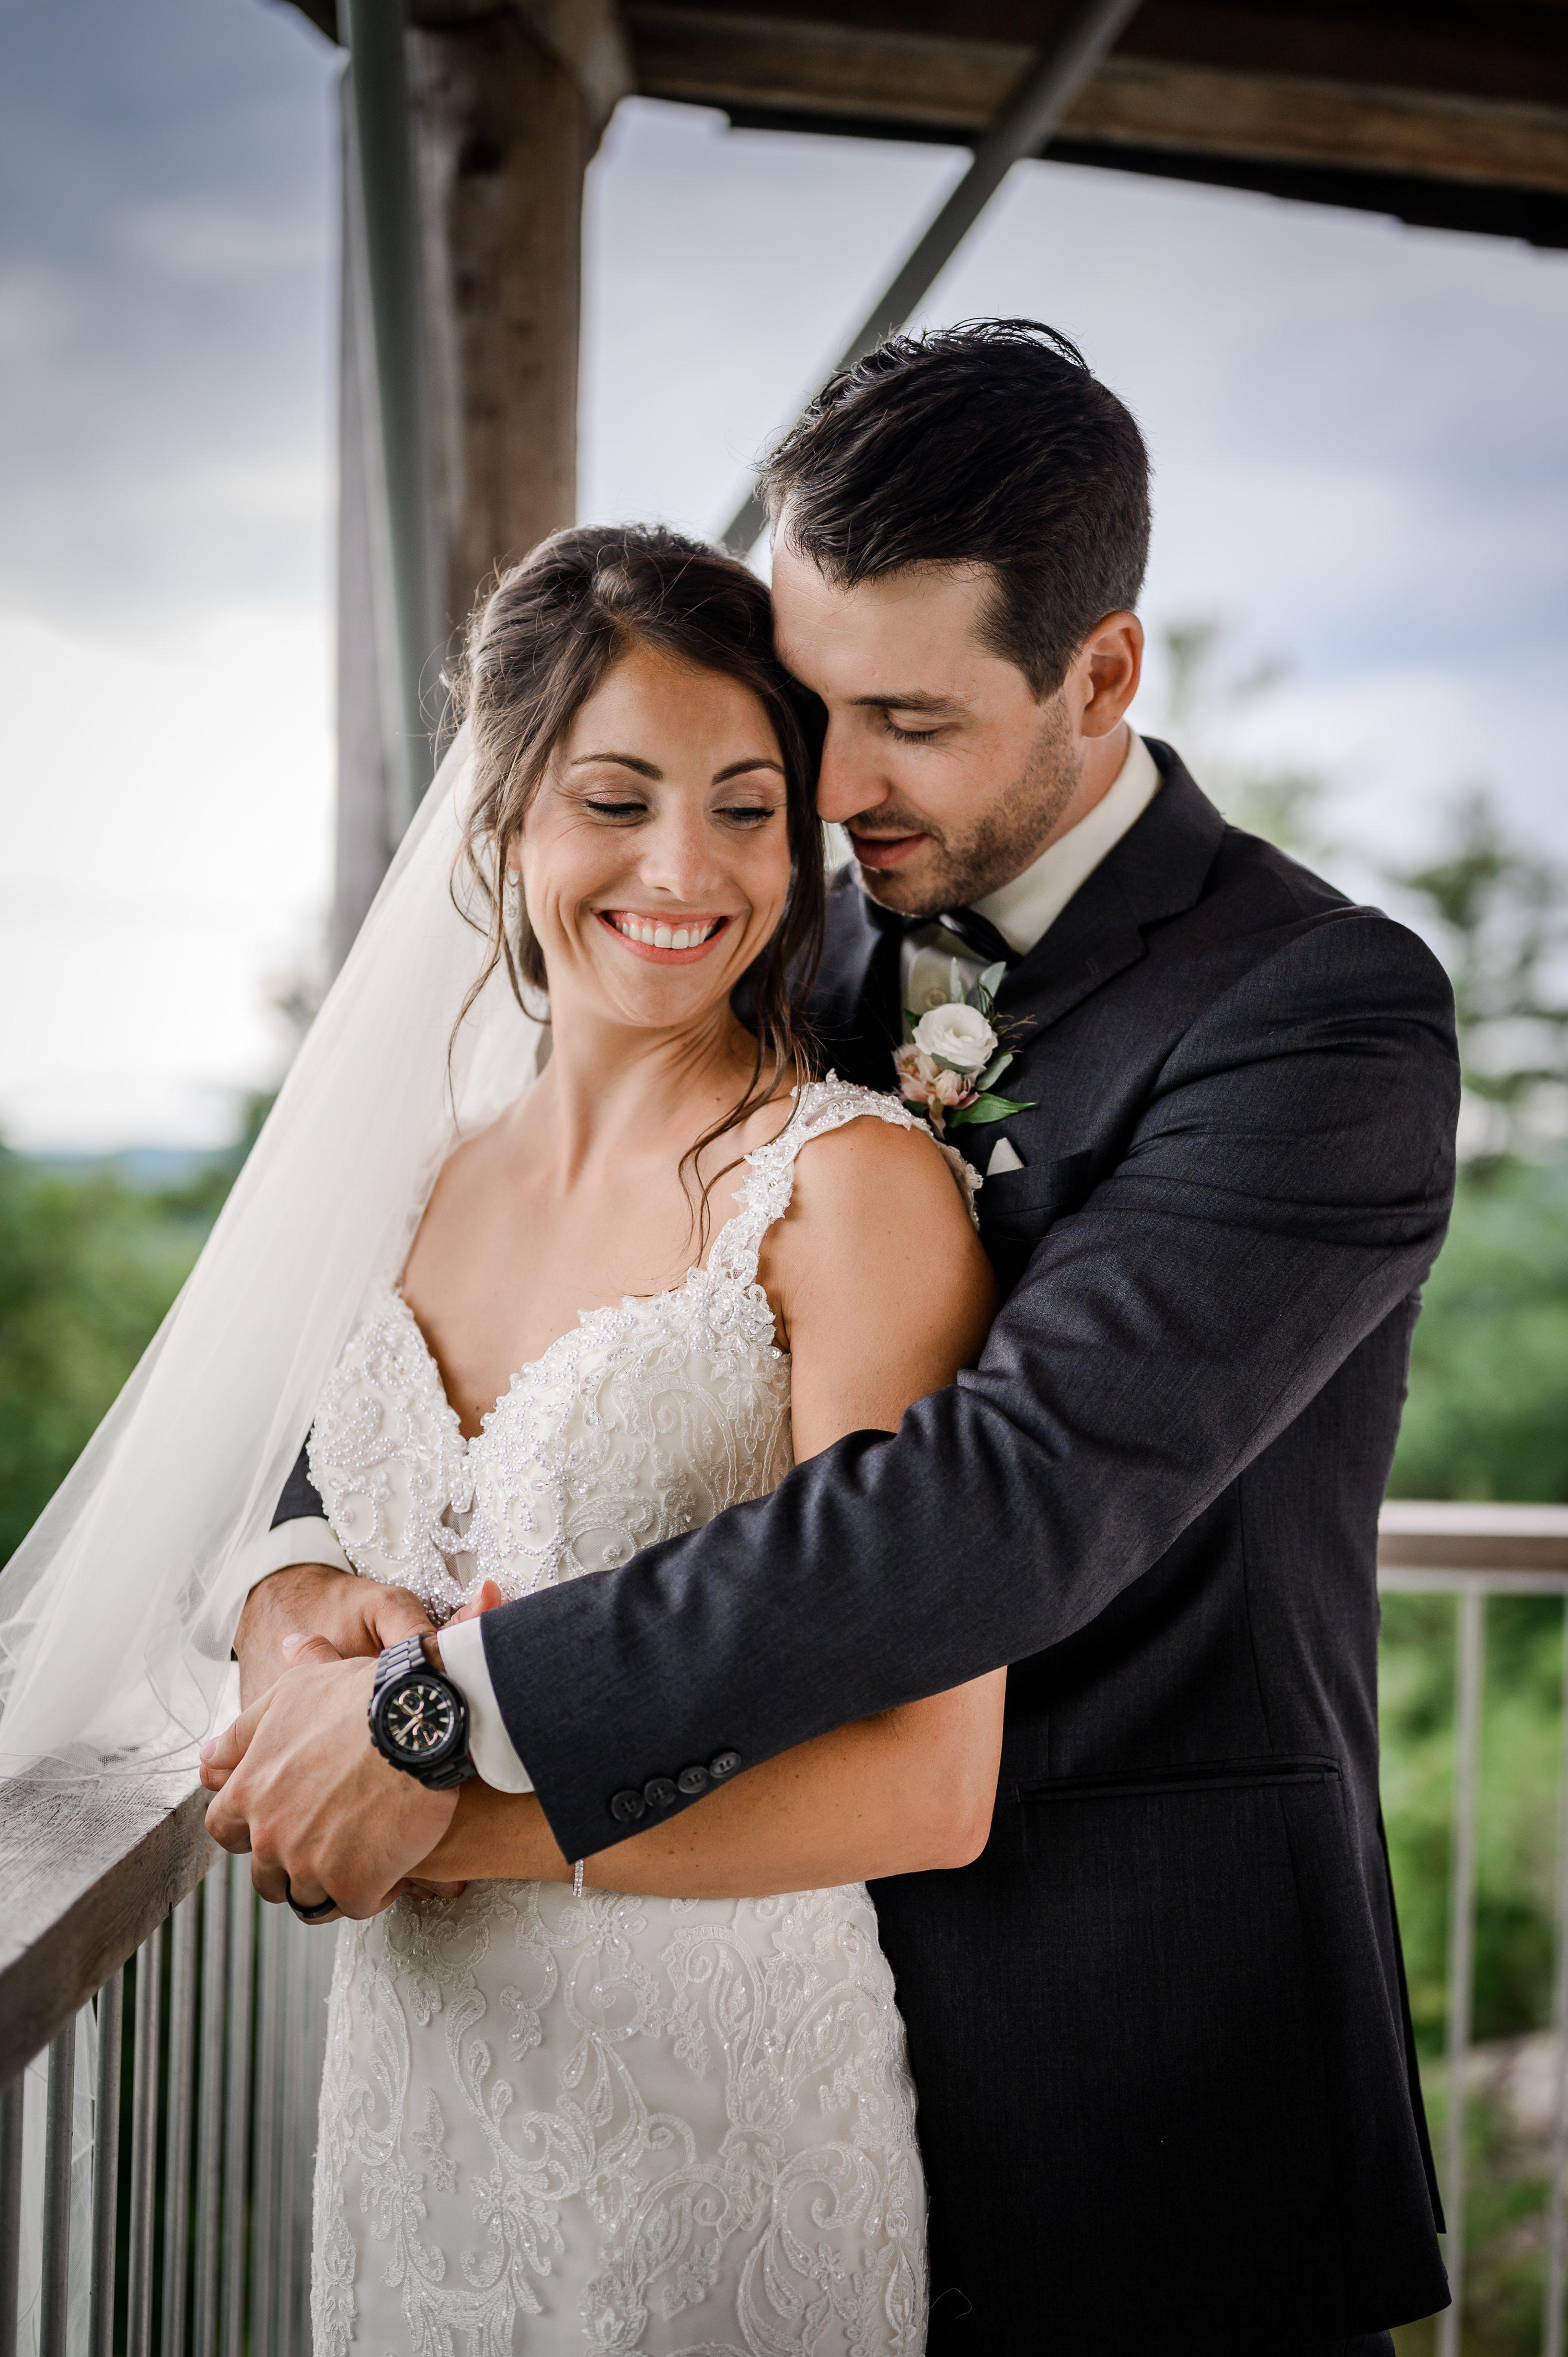 salle de mariage québec,wedding photographer